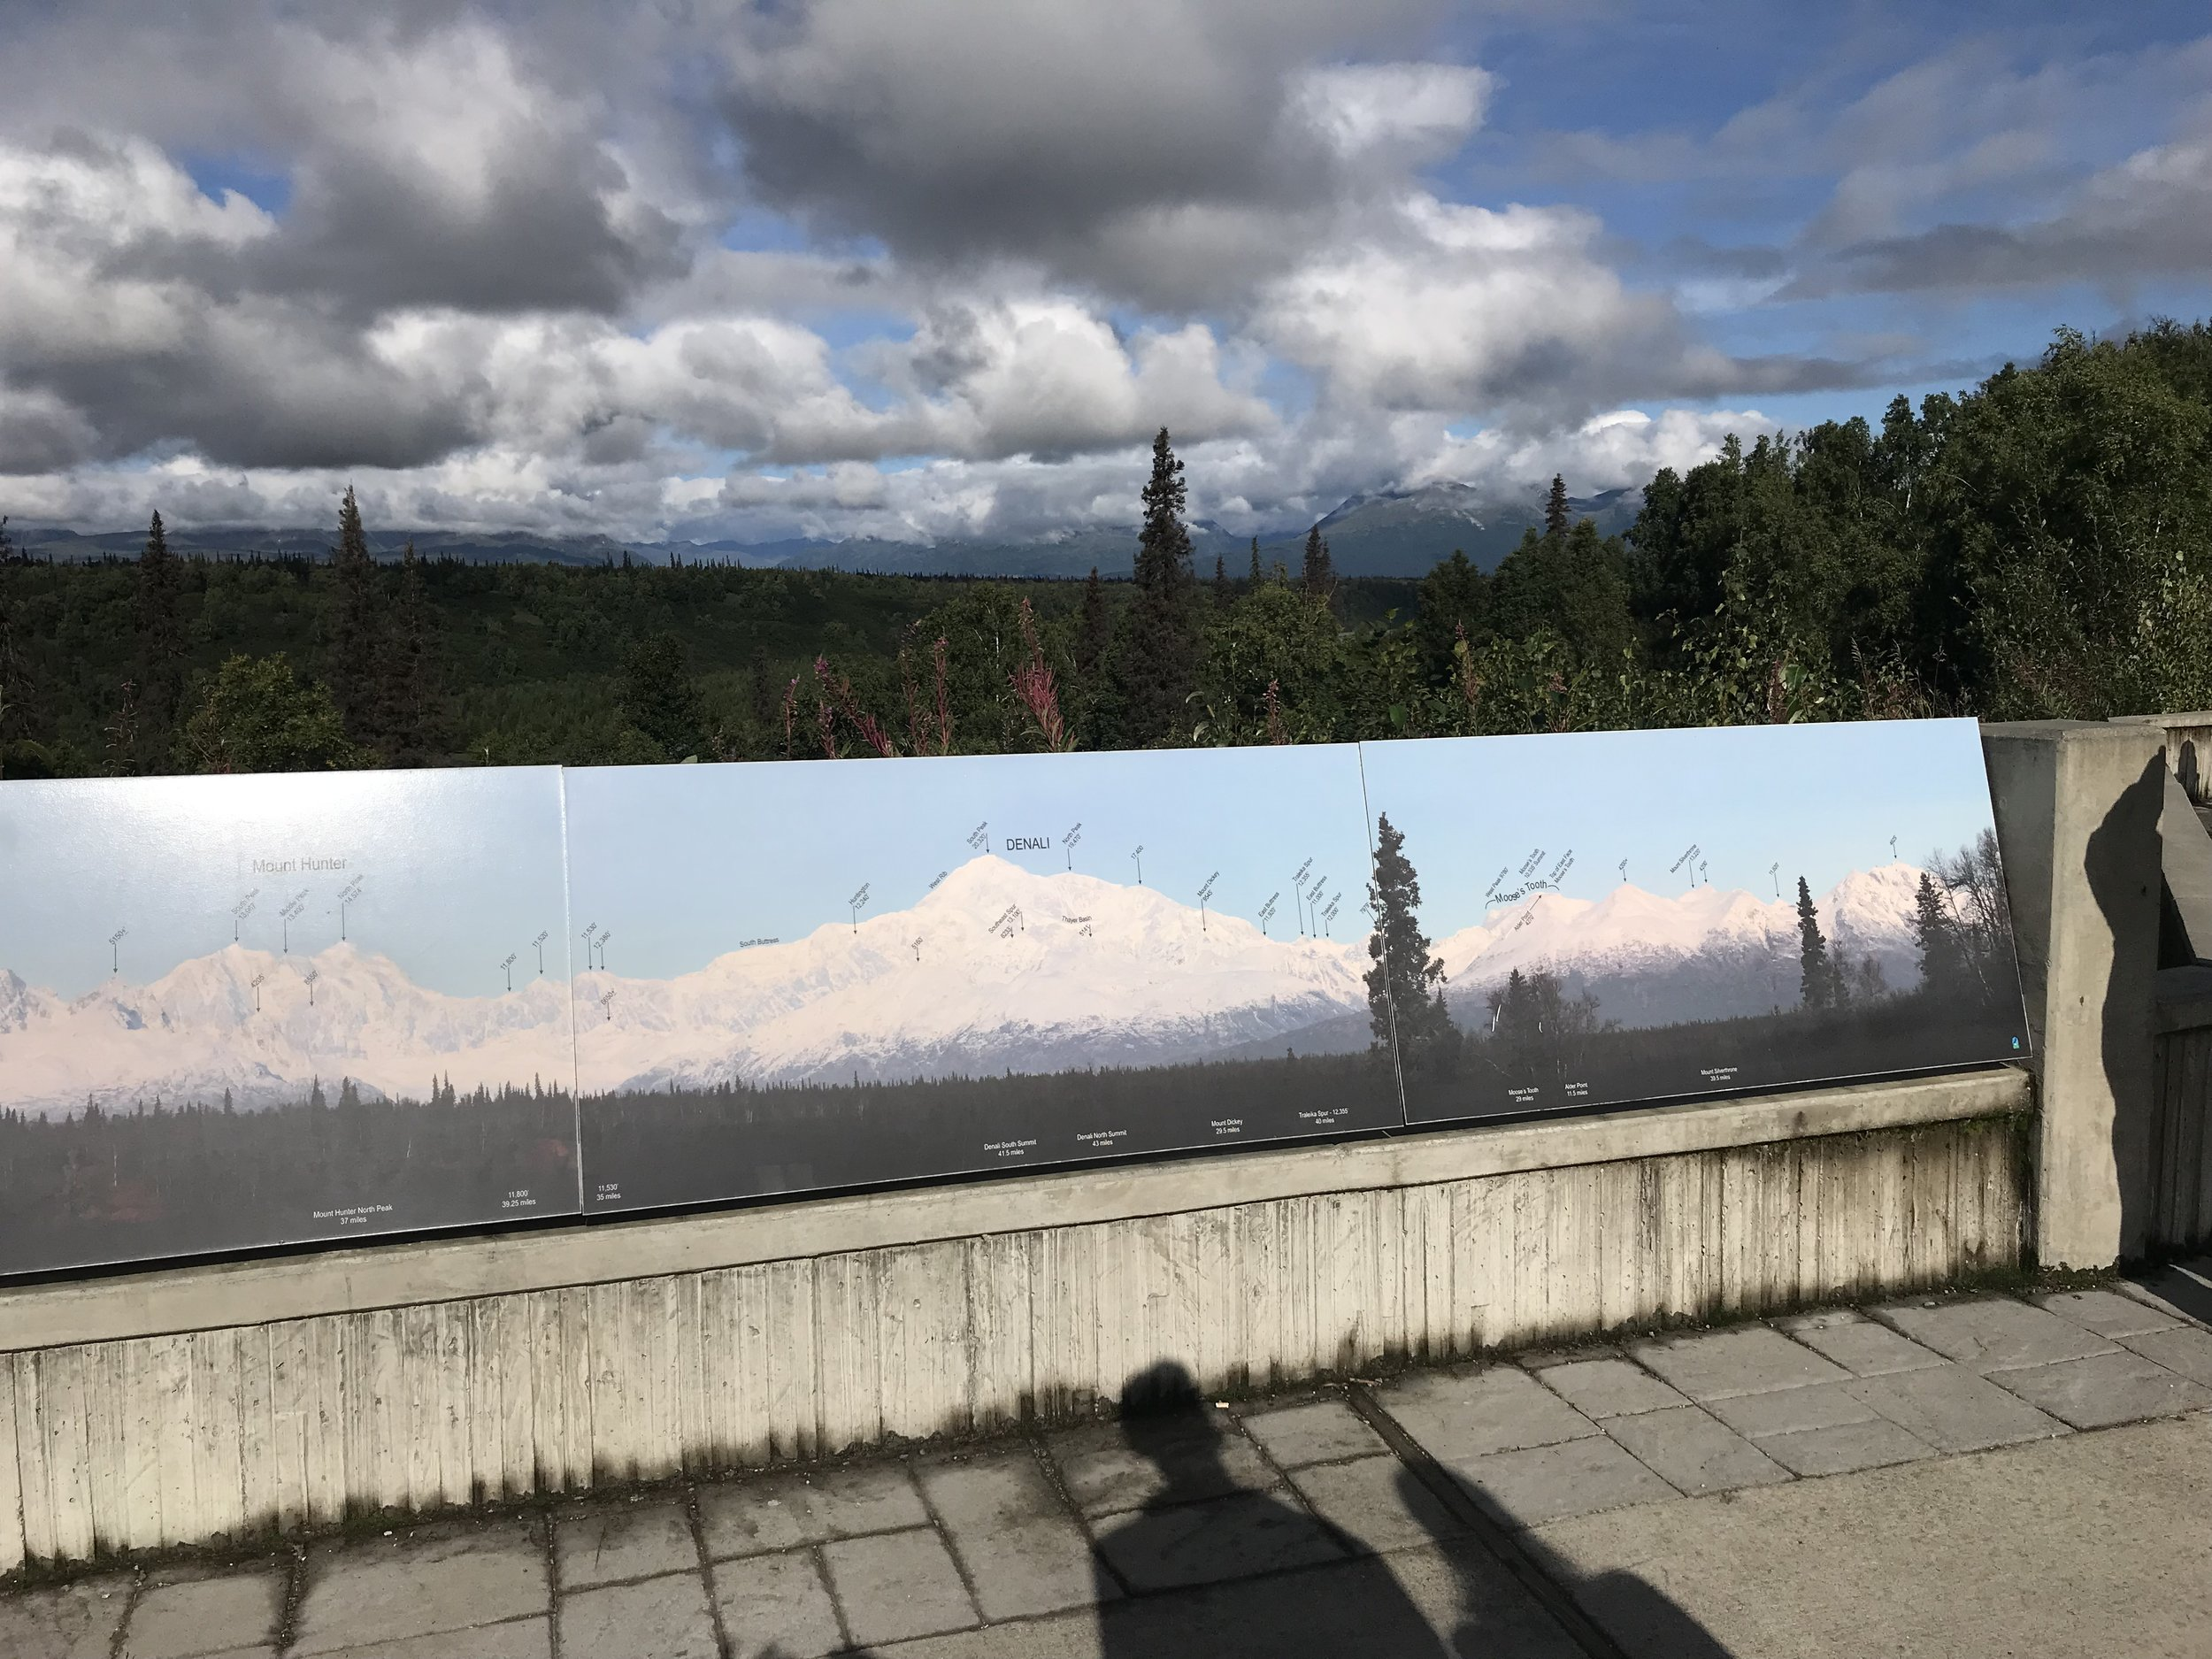 A painting at Denali State Park shows where Denali hides.